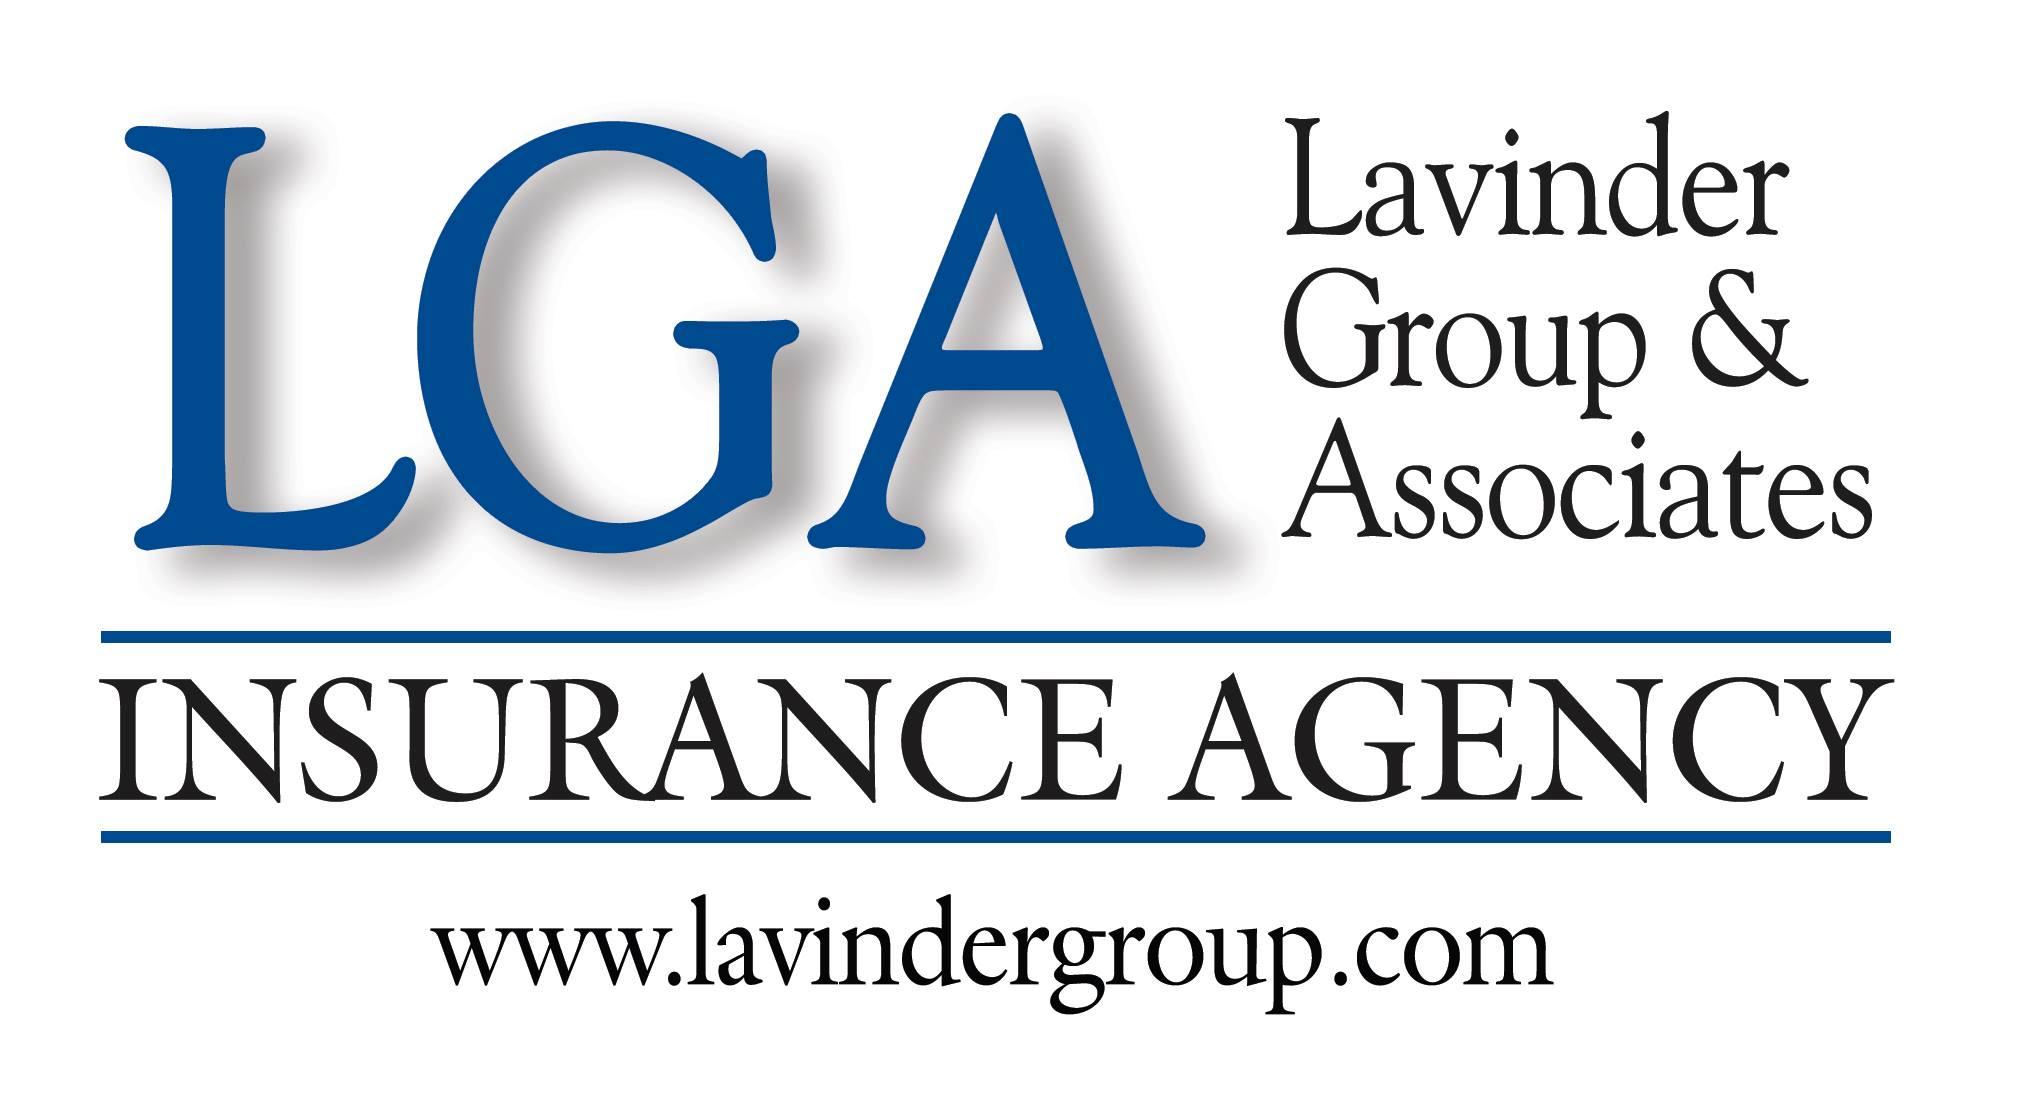 Lavinder Group & Associates